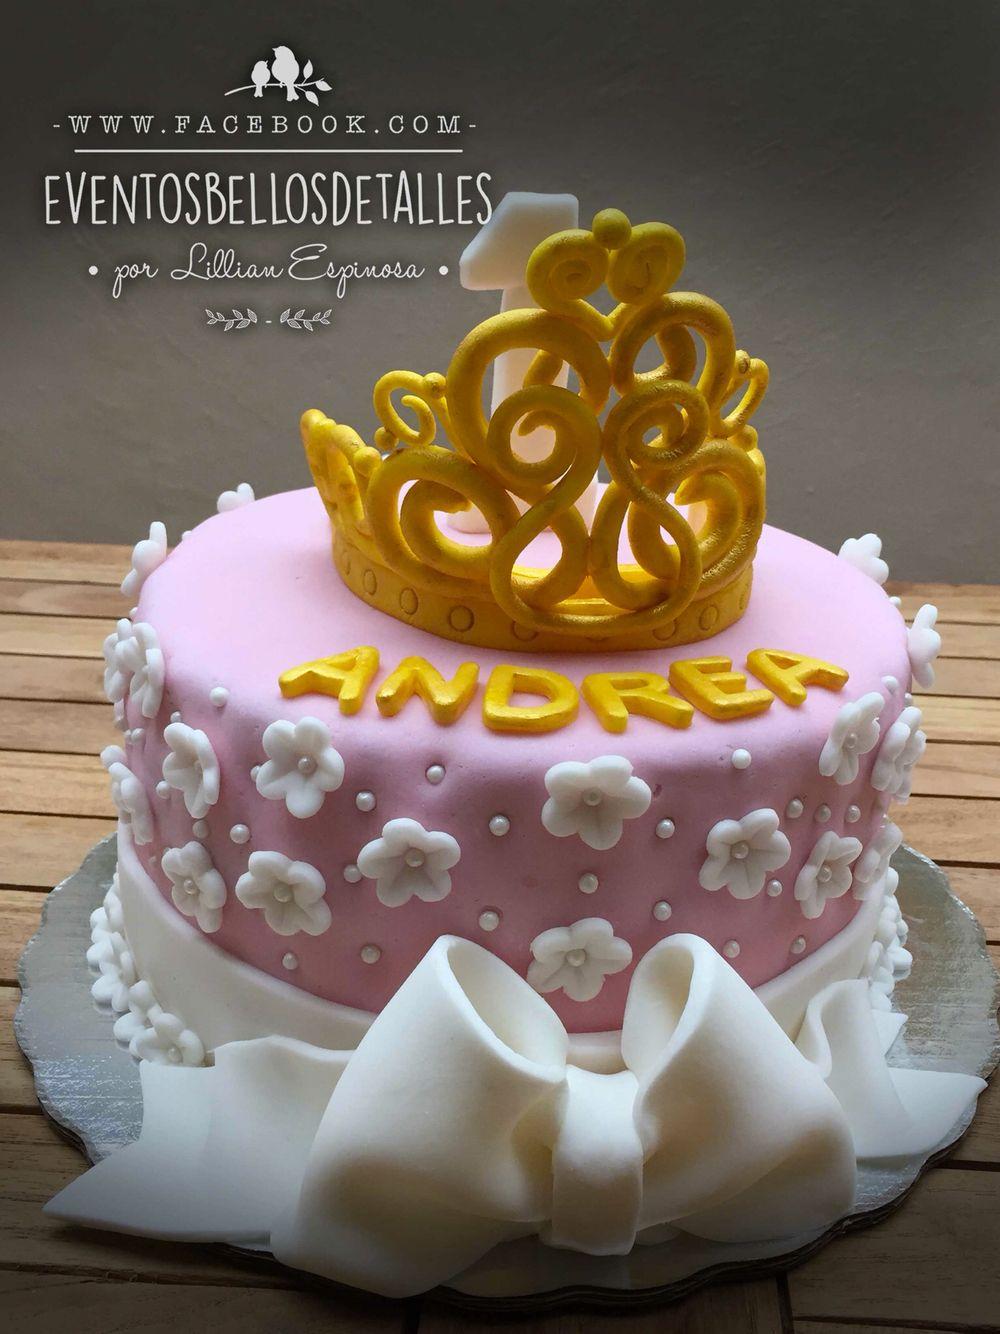 Pastel decorado con fondant para una princesa . Corona de fondant. Fondant crown. Cake design  http://www.facebook.com/eventosbellosdetalles